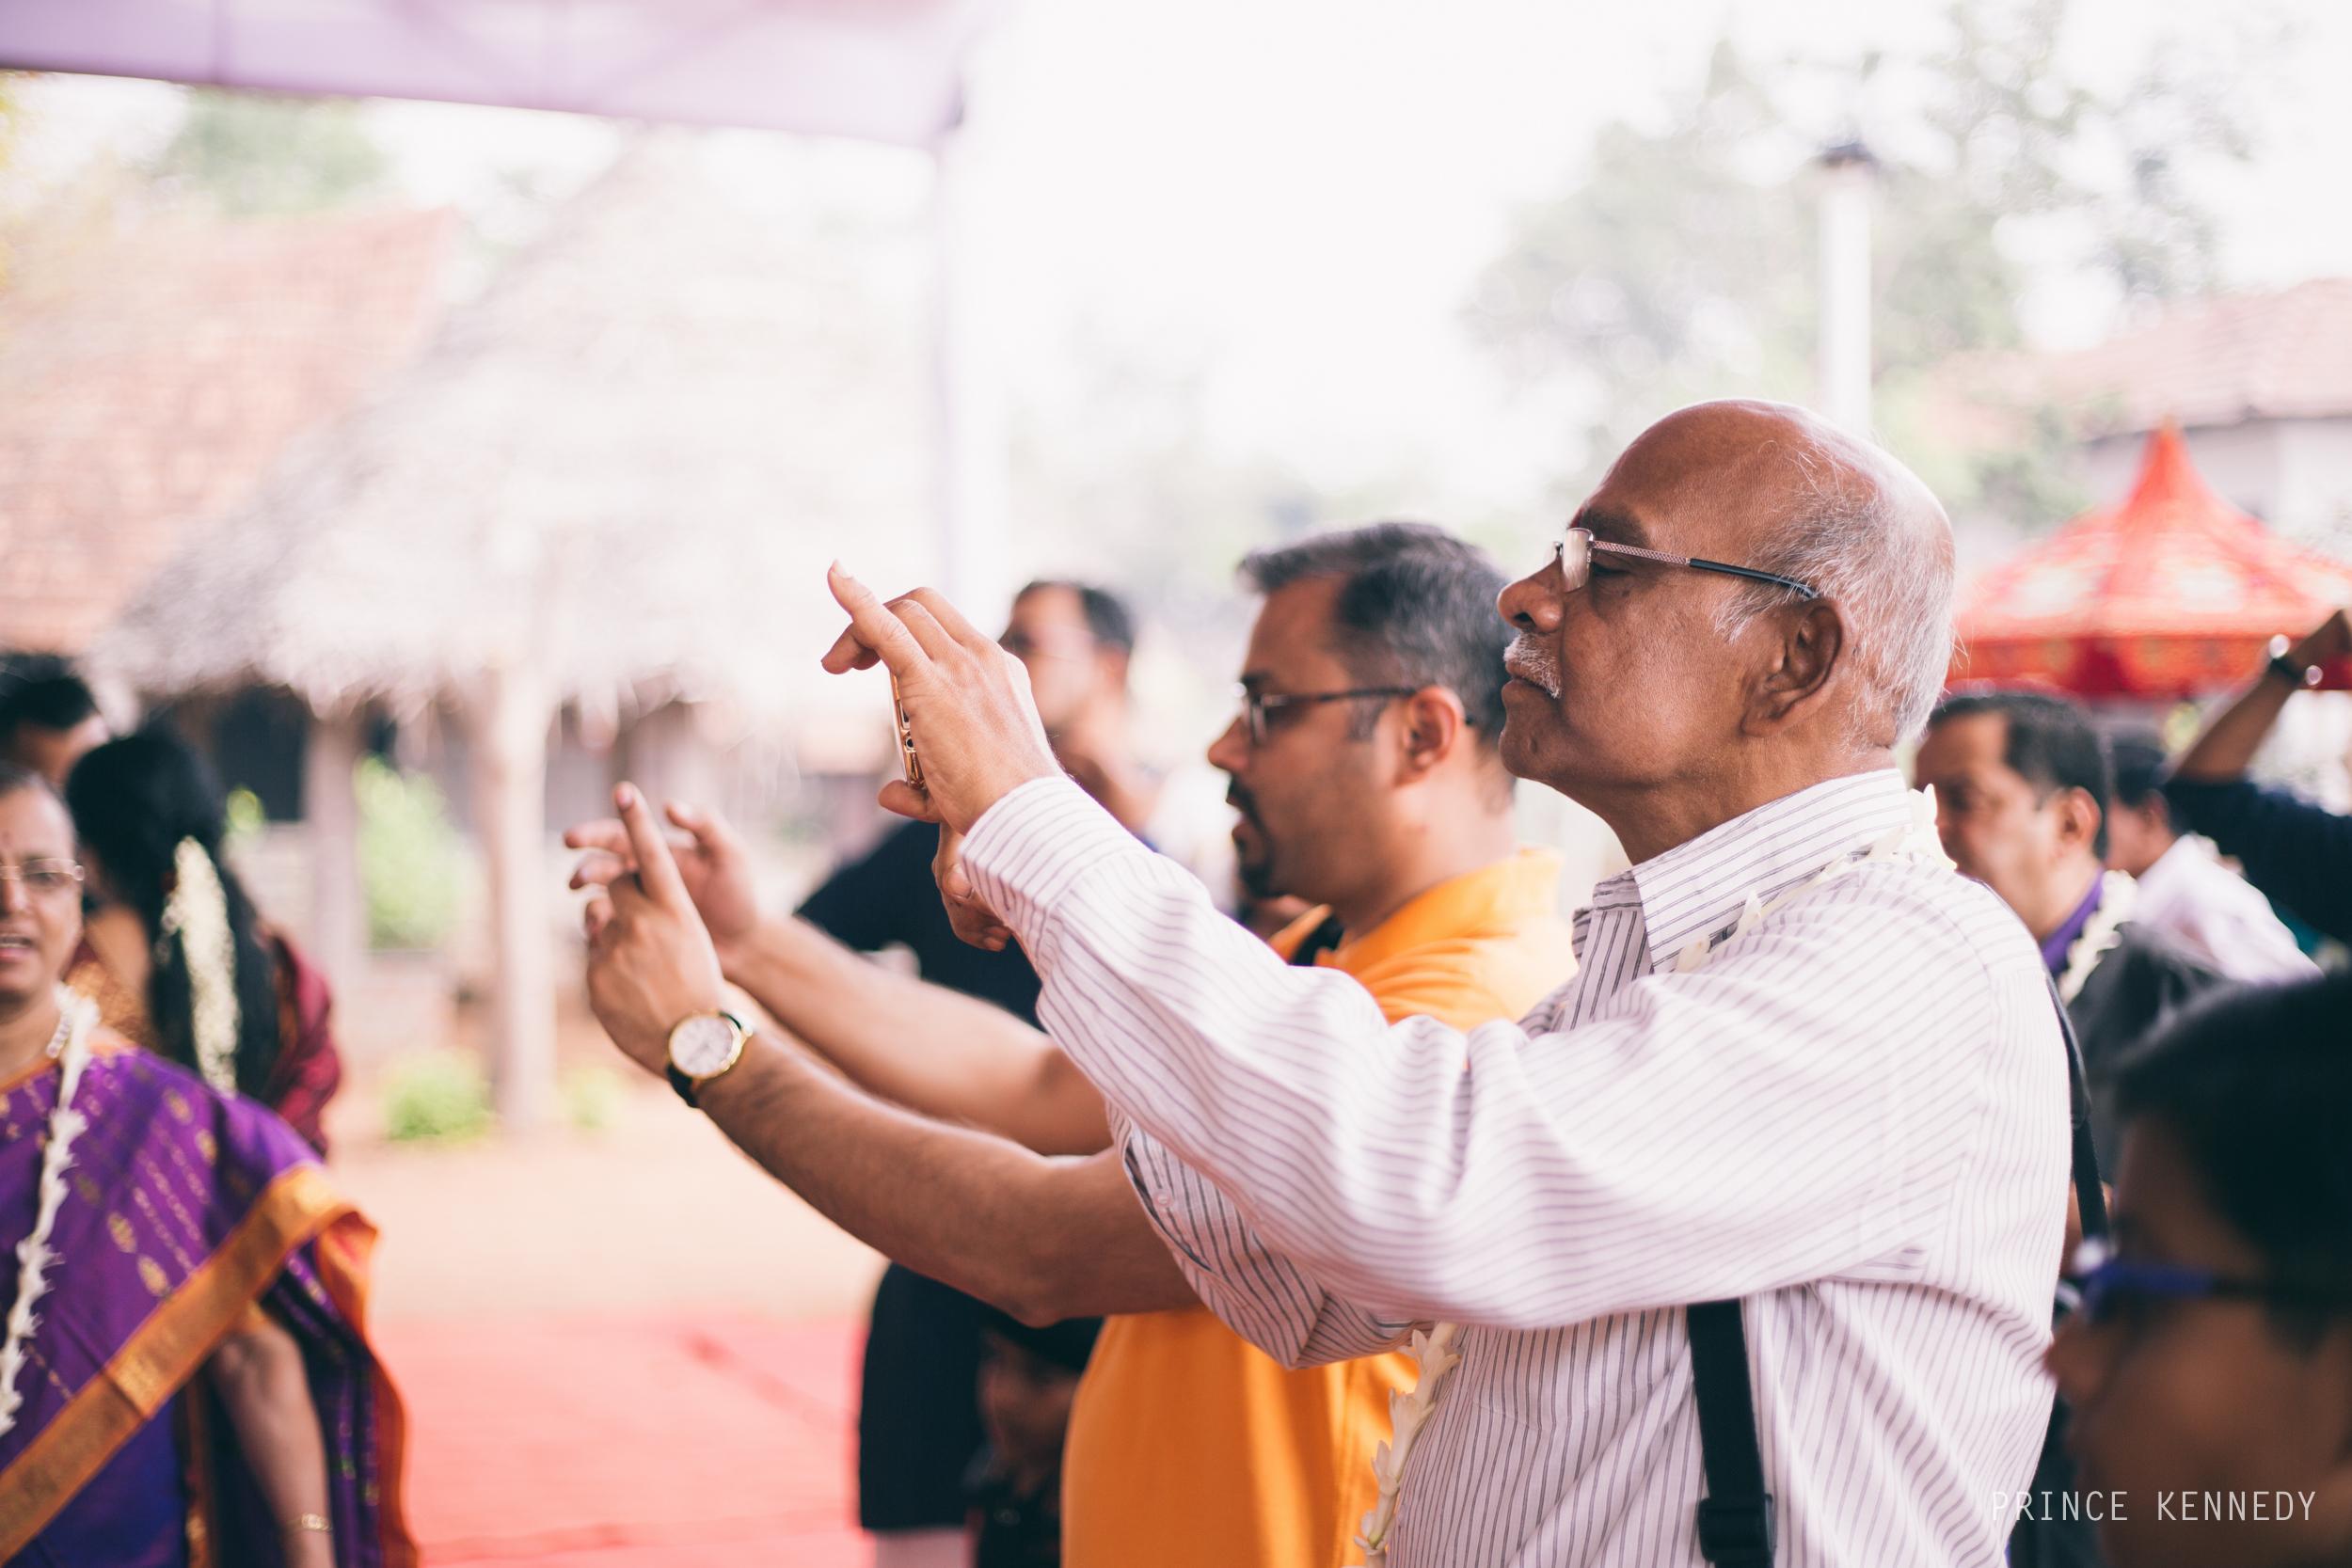 Athmajja-Nithesh-Engagement-Couple-Portrait-Portraiture-Wedding-Couple-Portrait-Chennai-Photographer-Candid-Photography-Destination-Best-Prince-Kennedy-Photography-116.jpg